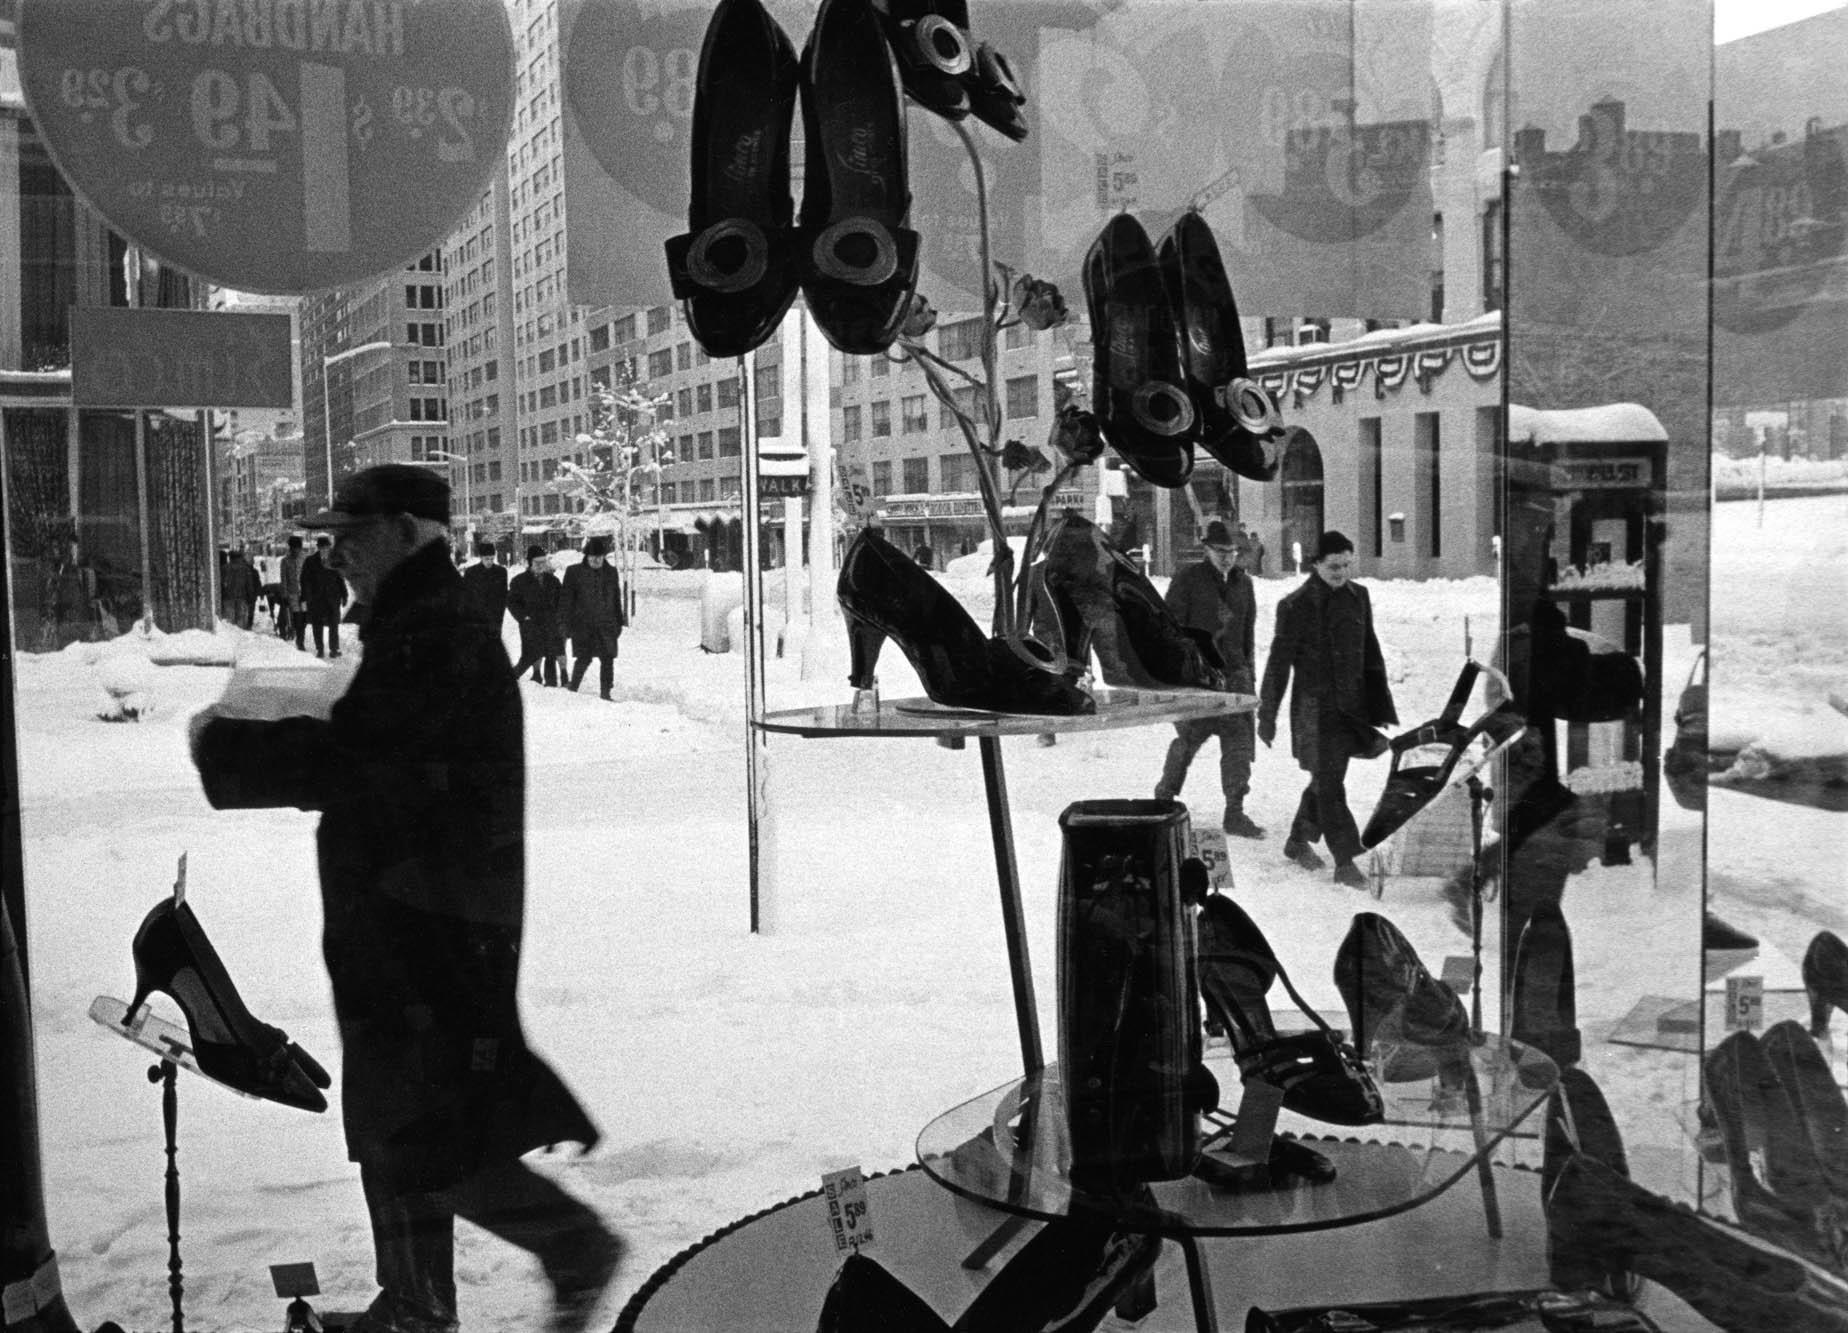 Copy of Shoe Store Window (New York, NY), 1969